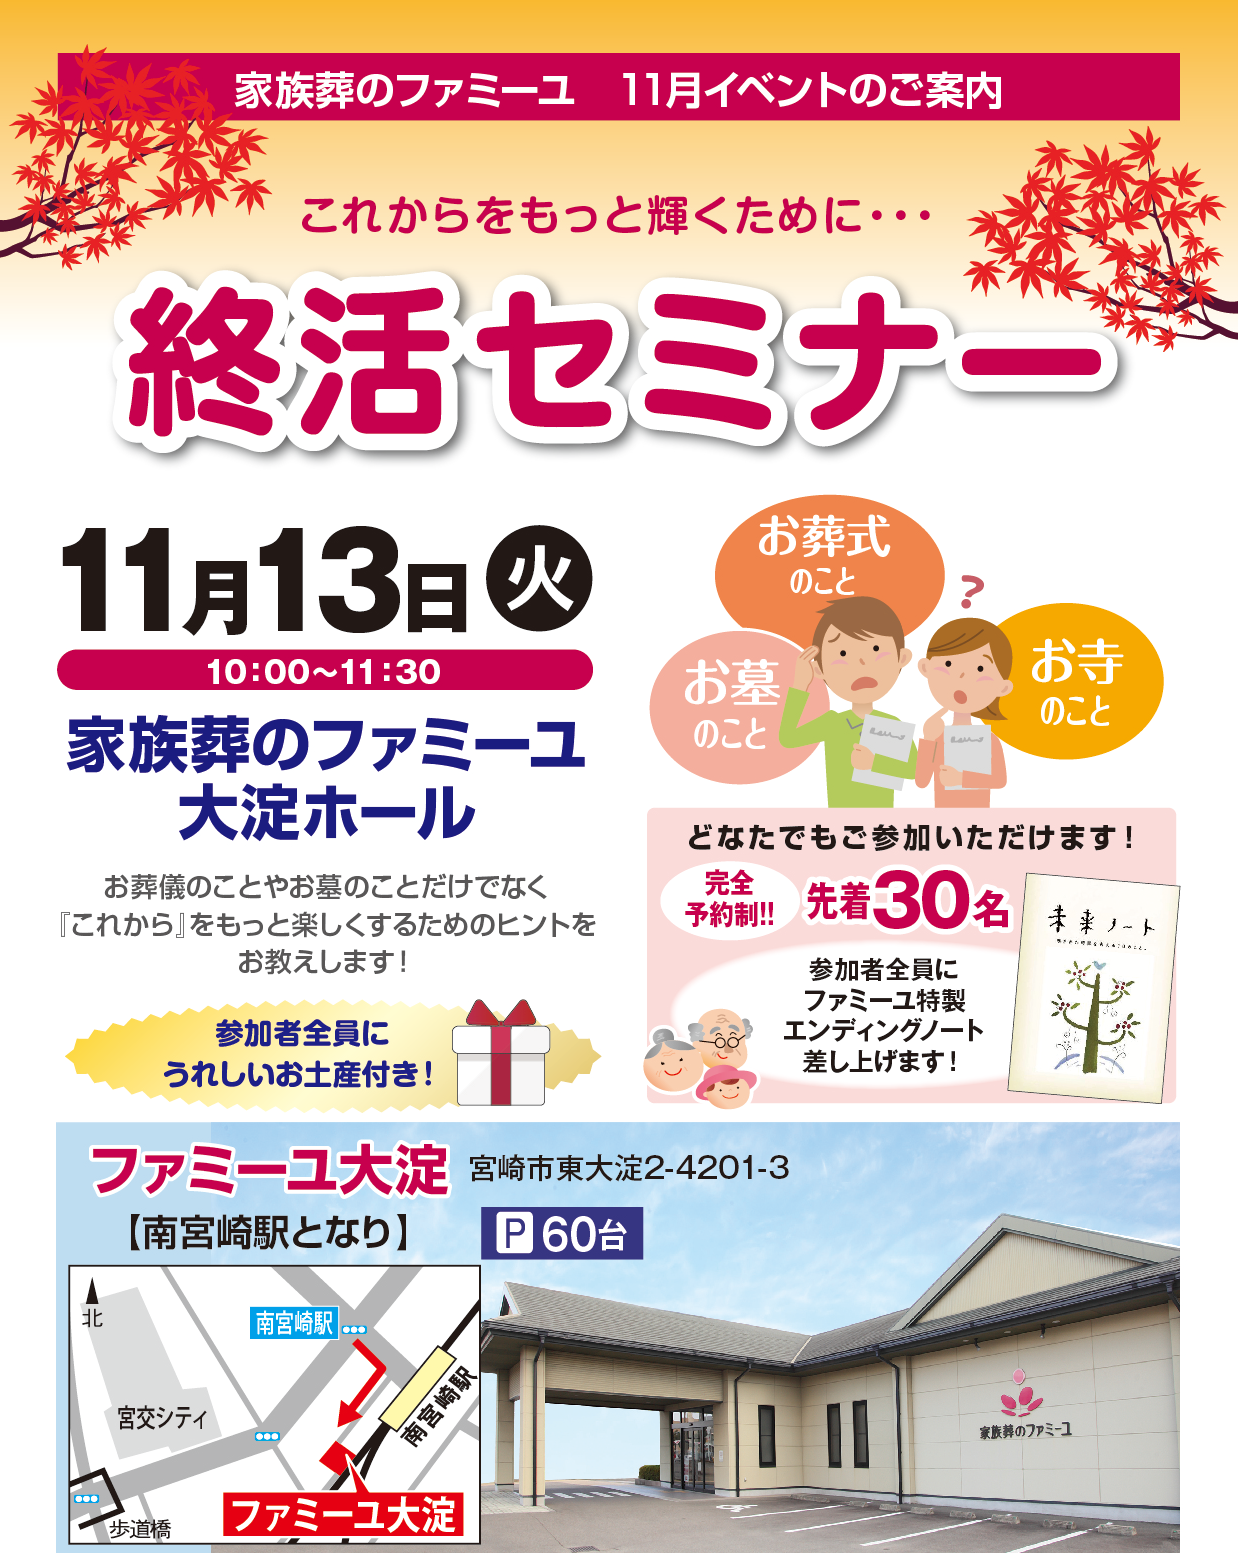 https://www.famille-kazokusou.com/search_area/familleooyodo_shukatsu.png